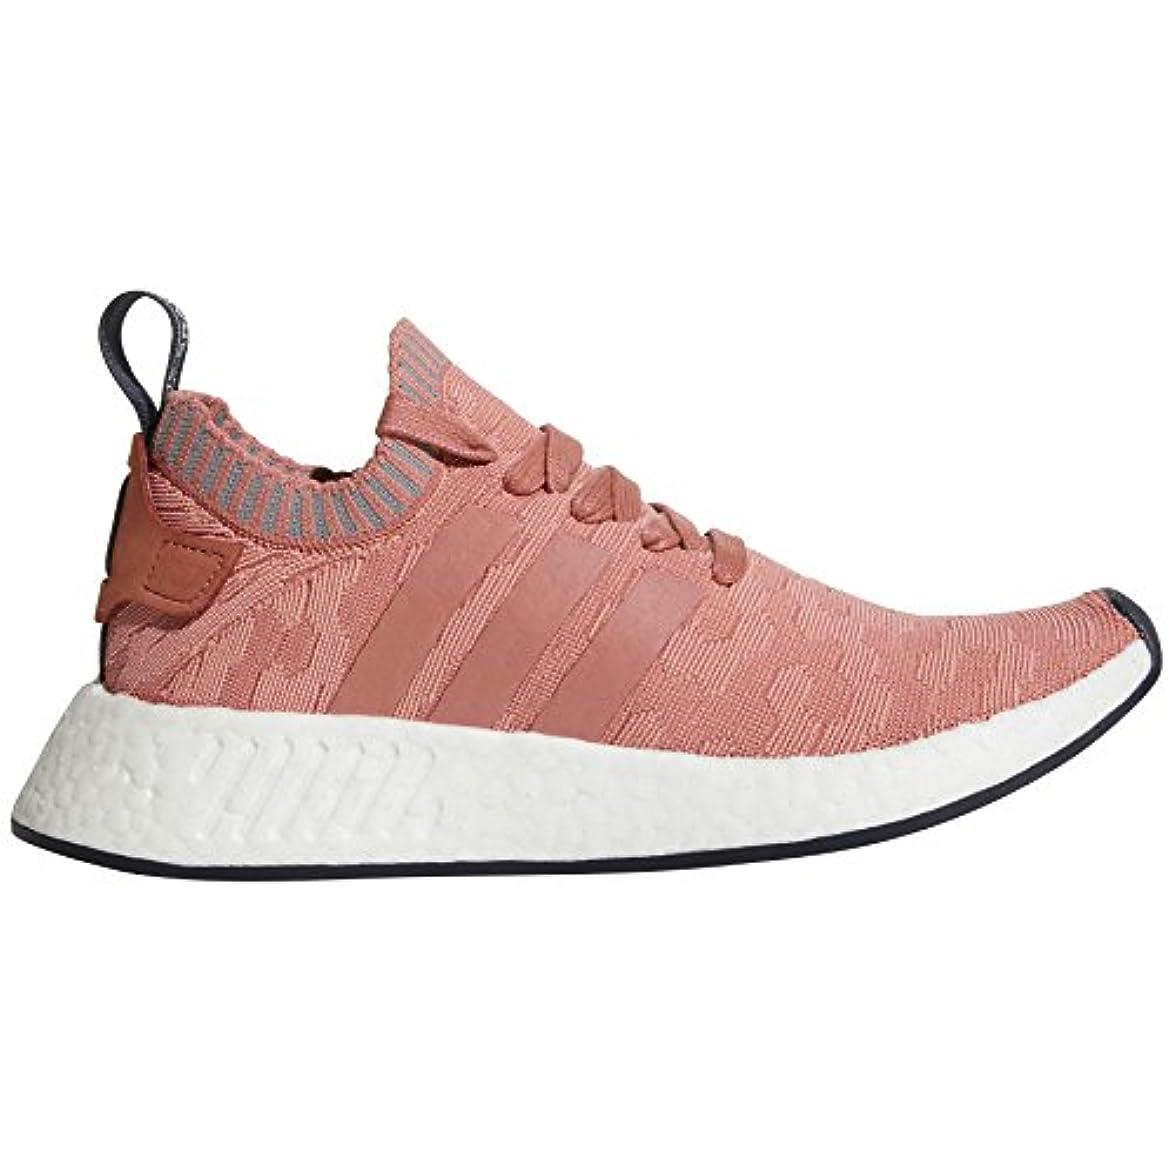 Adidas Originalsnmd r2 Pk W - Nmd r2 Da Donna Uomo Rosa raw Pink raw Pink grey Three 36 5 Eu